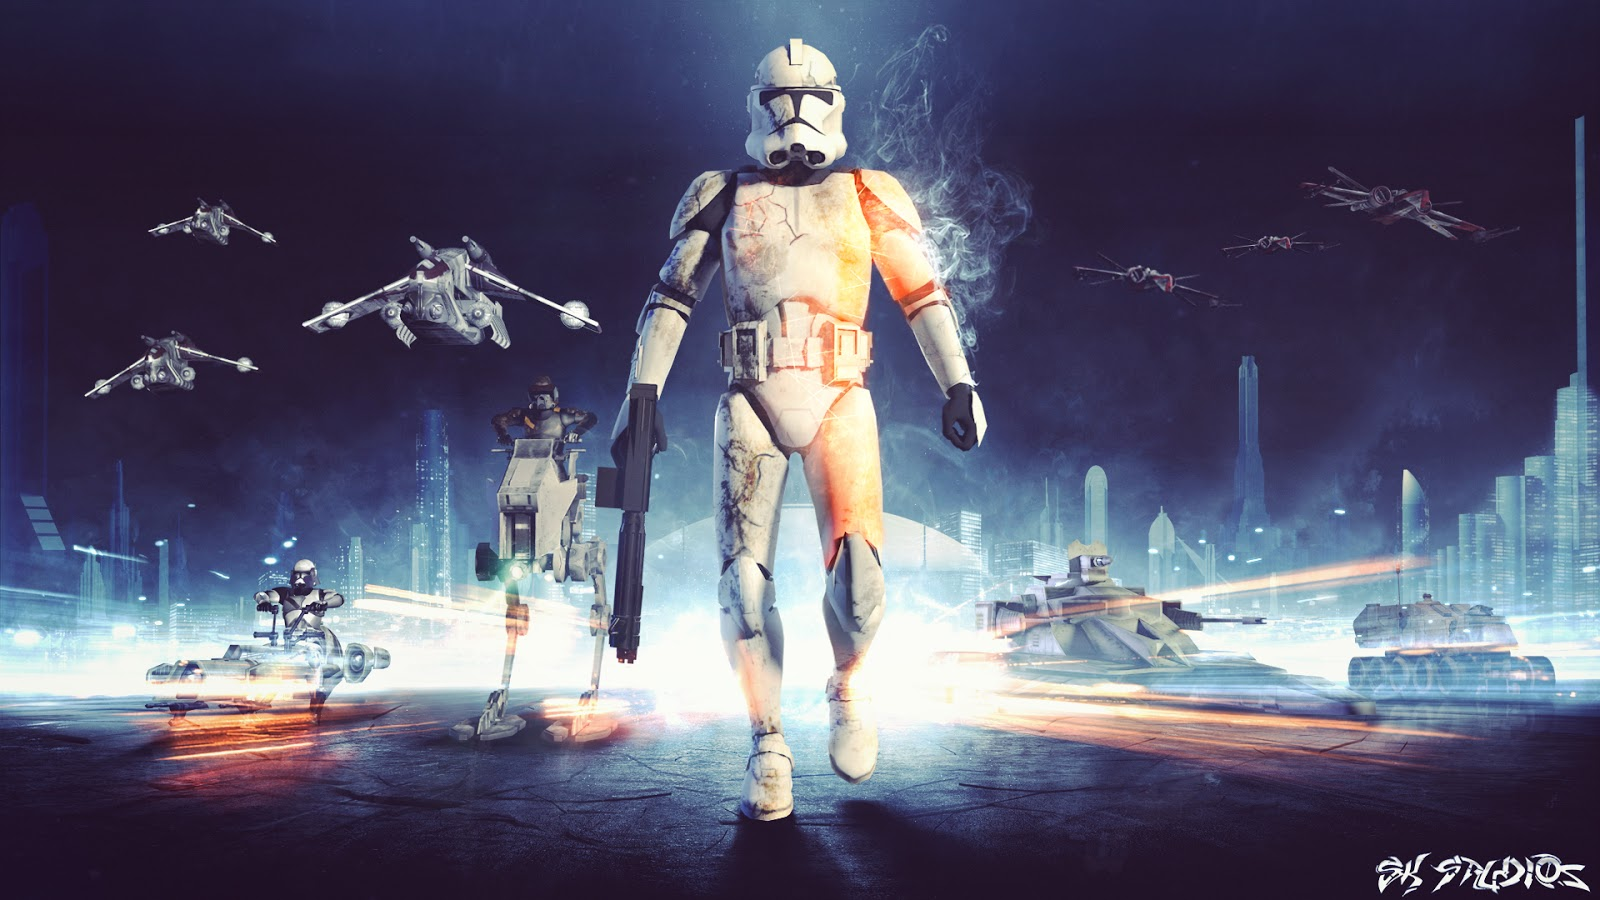 Wallpapers HD: Wallpapers De Star Wars Battlefront HD Y